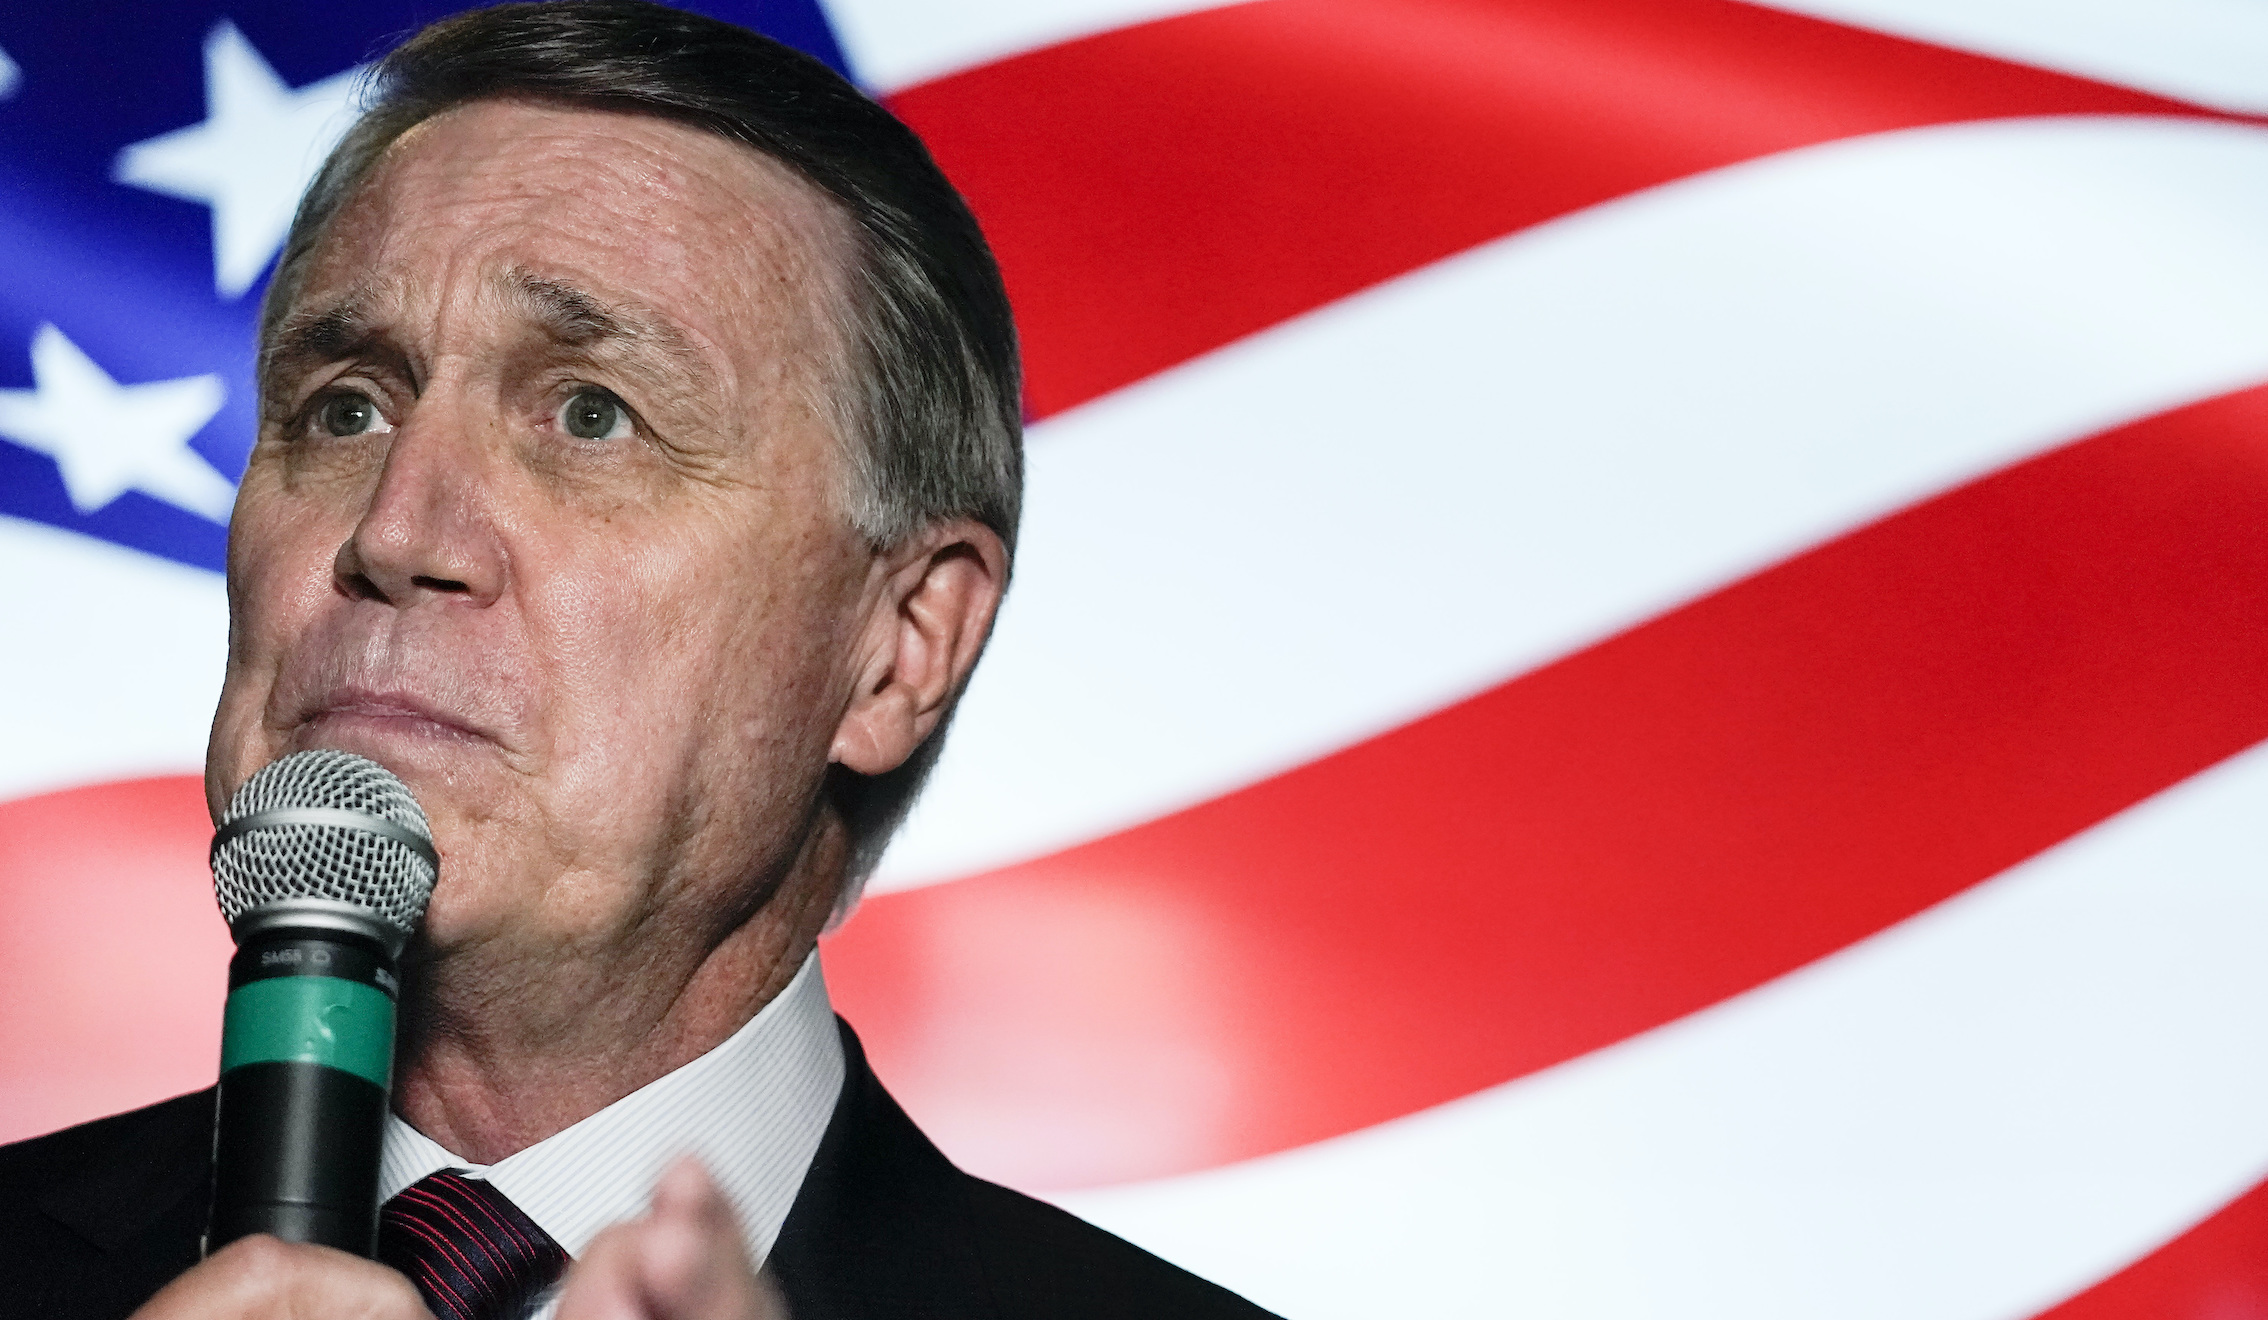 Perdue relies on Republican loyalty after coronavirus scare derails Senate campaign